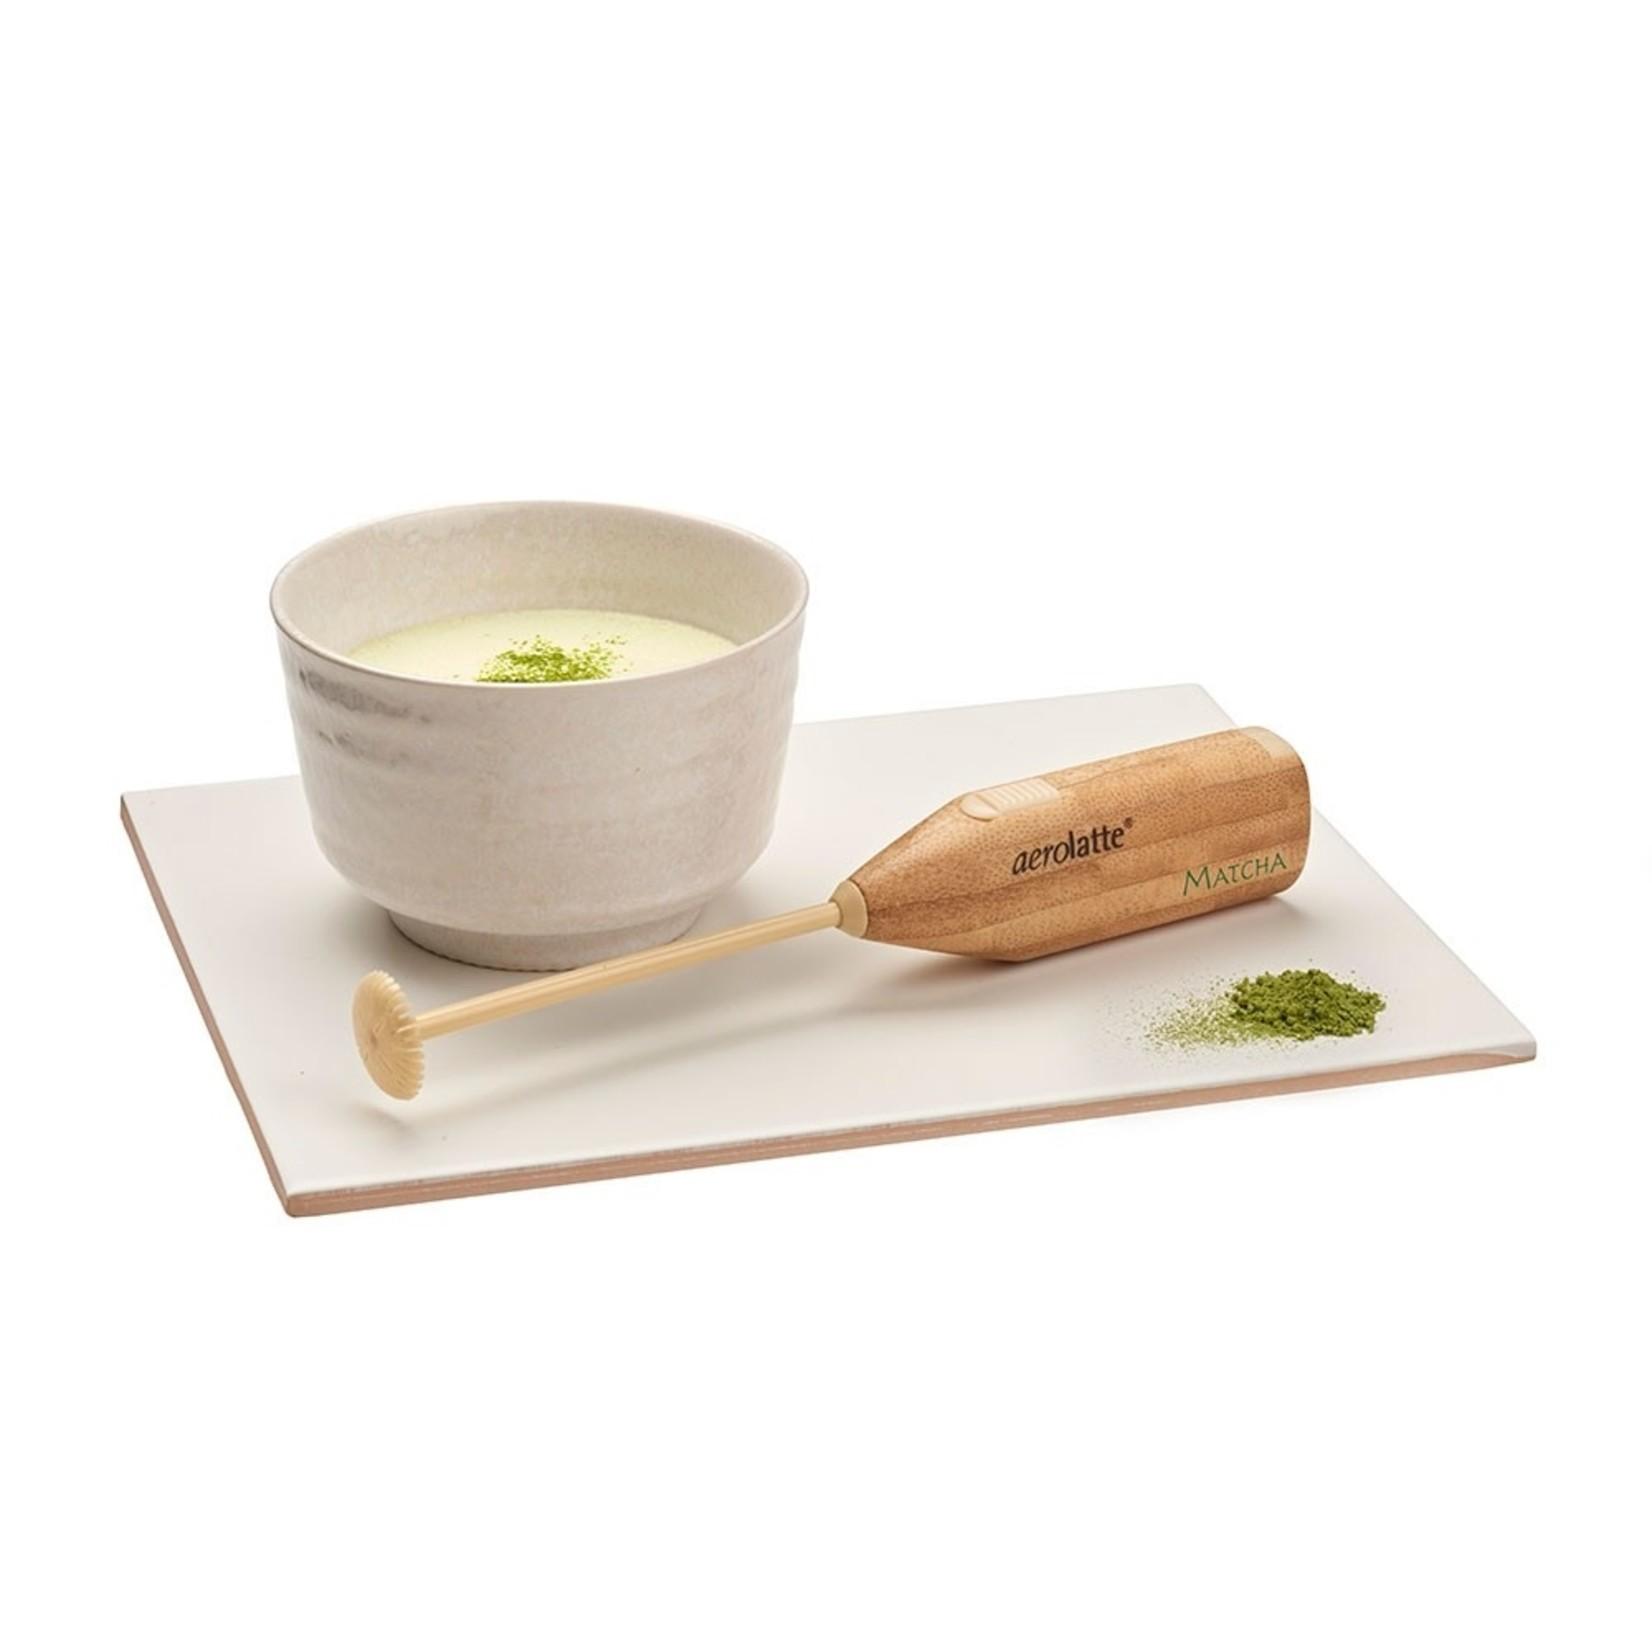 Aerolatte Matcha Tea Whisk